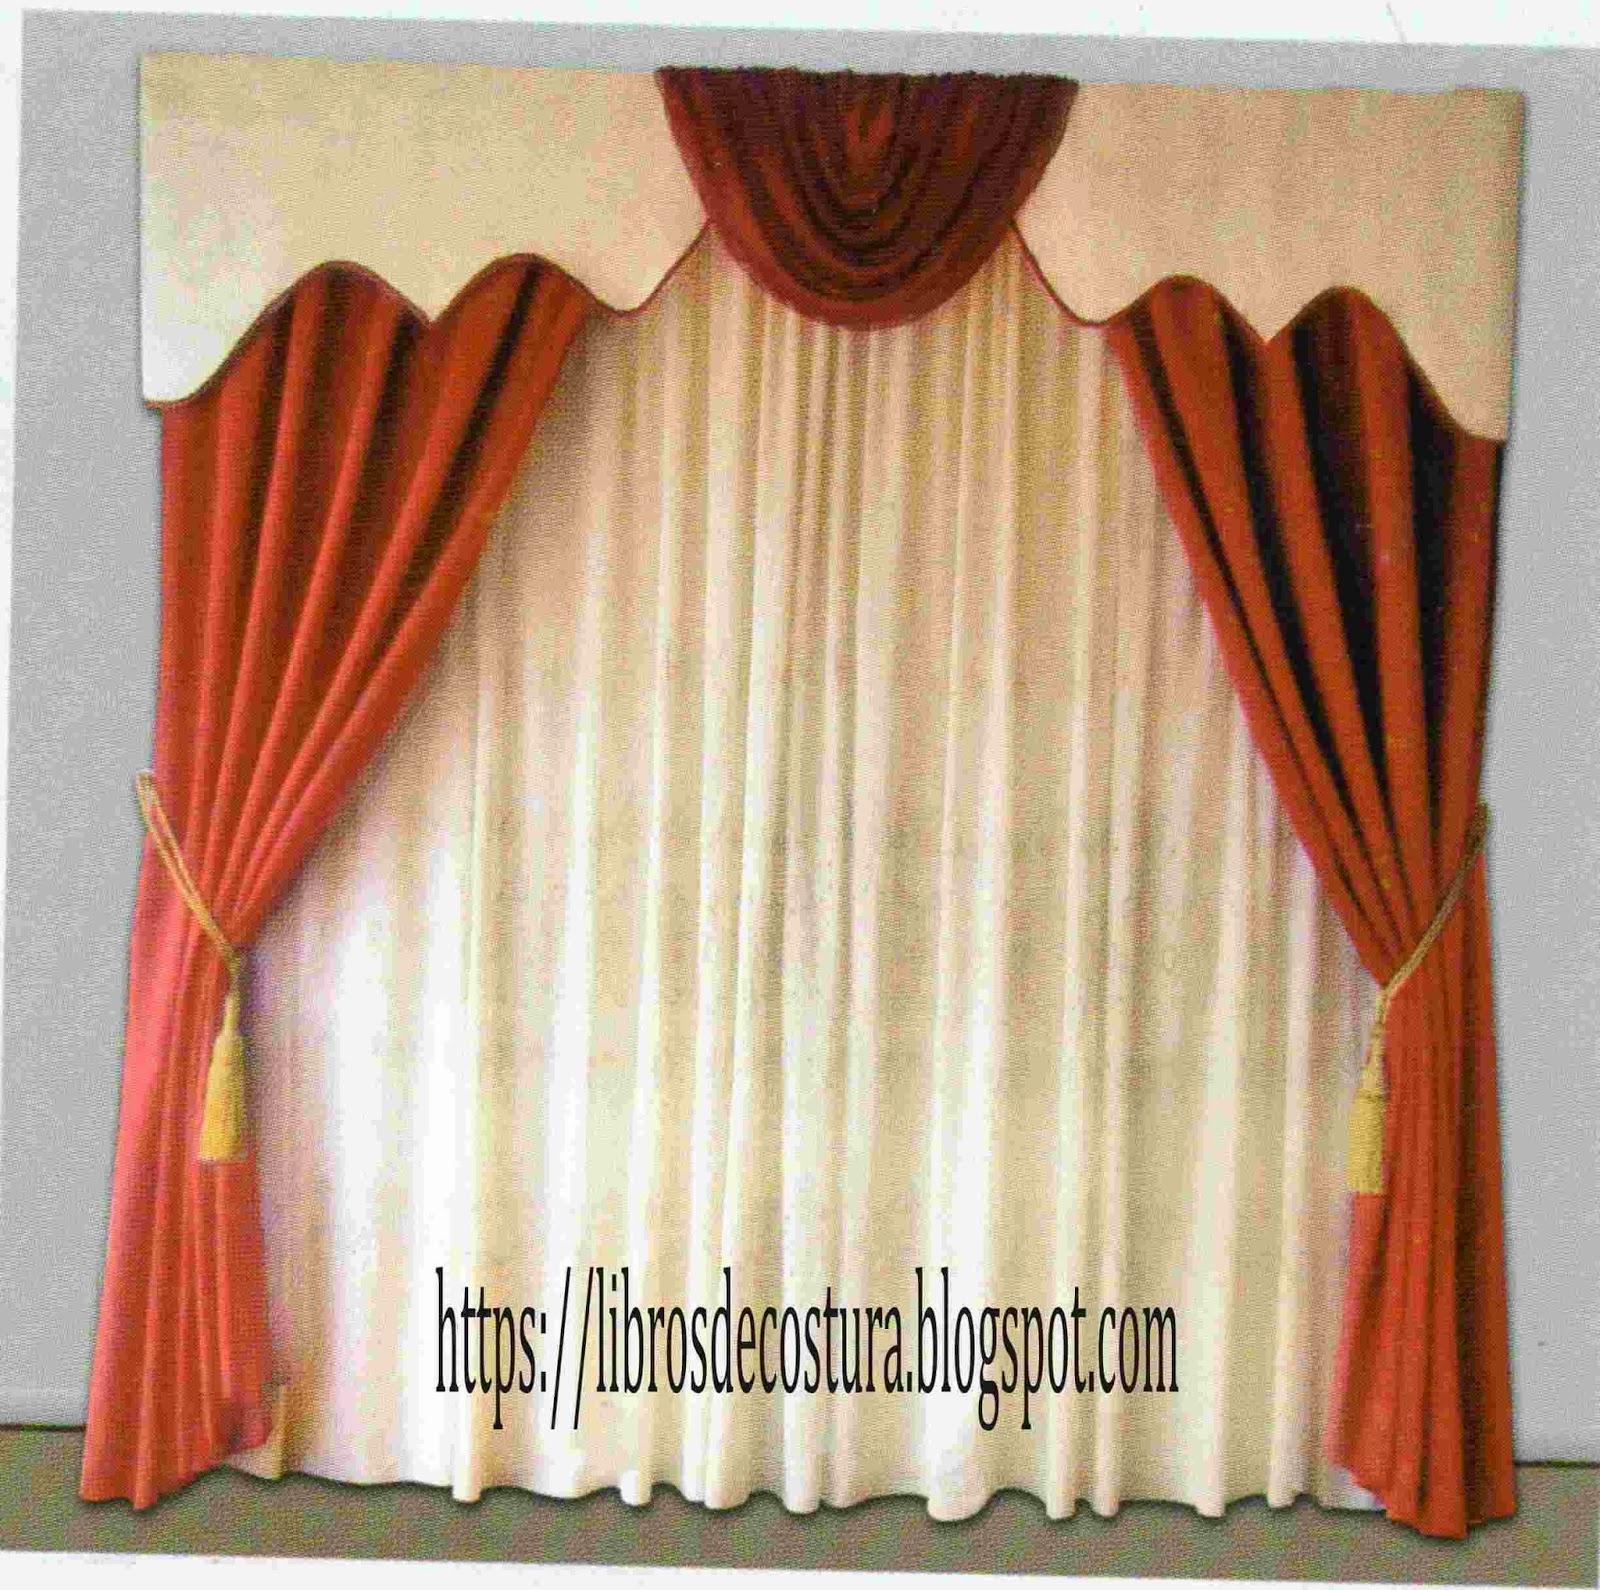 Libros de costura como hacer cortinas paso a paso for Ver cortinas de comedor